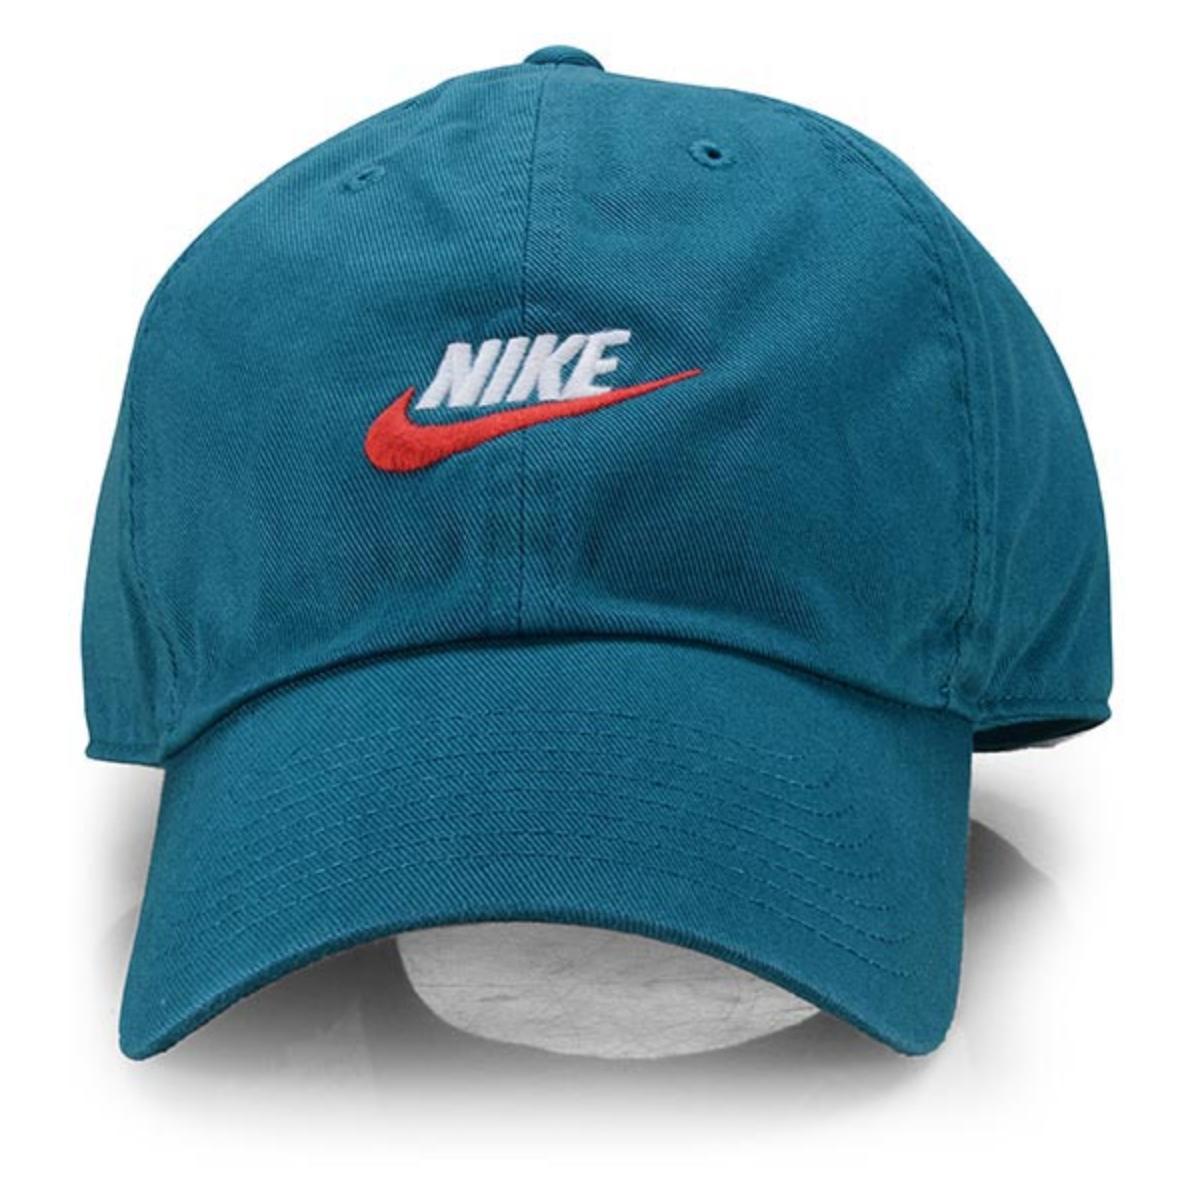 Boné Unisex Nike 913011-381 Sportwear H86 Verde